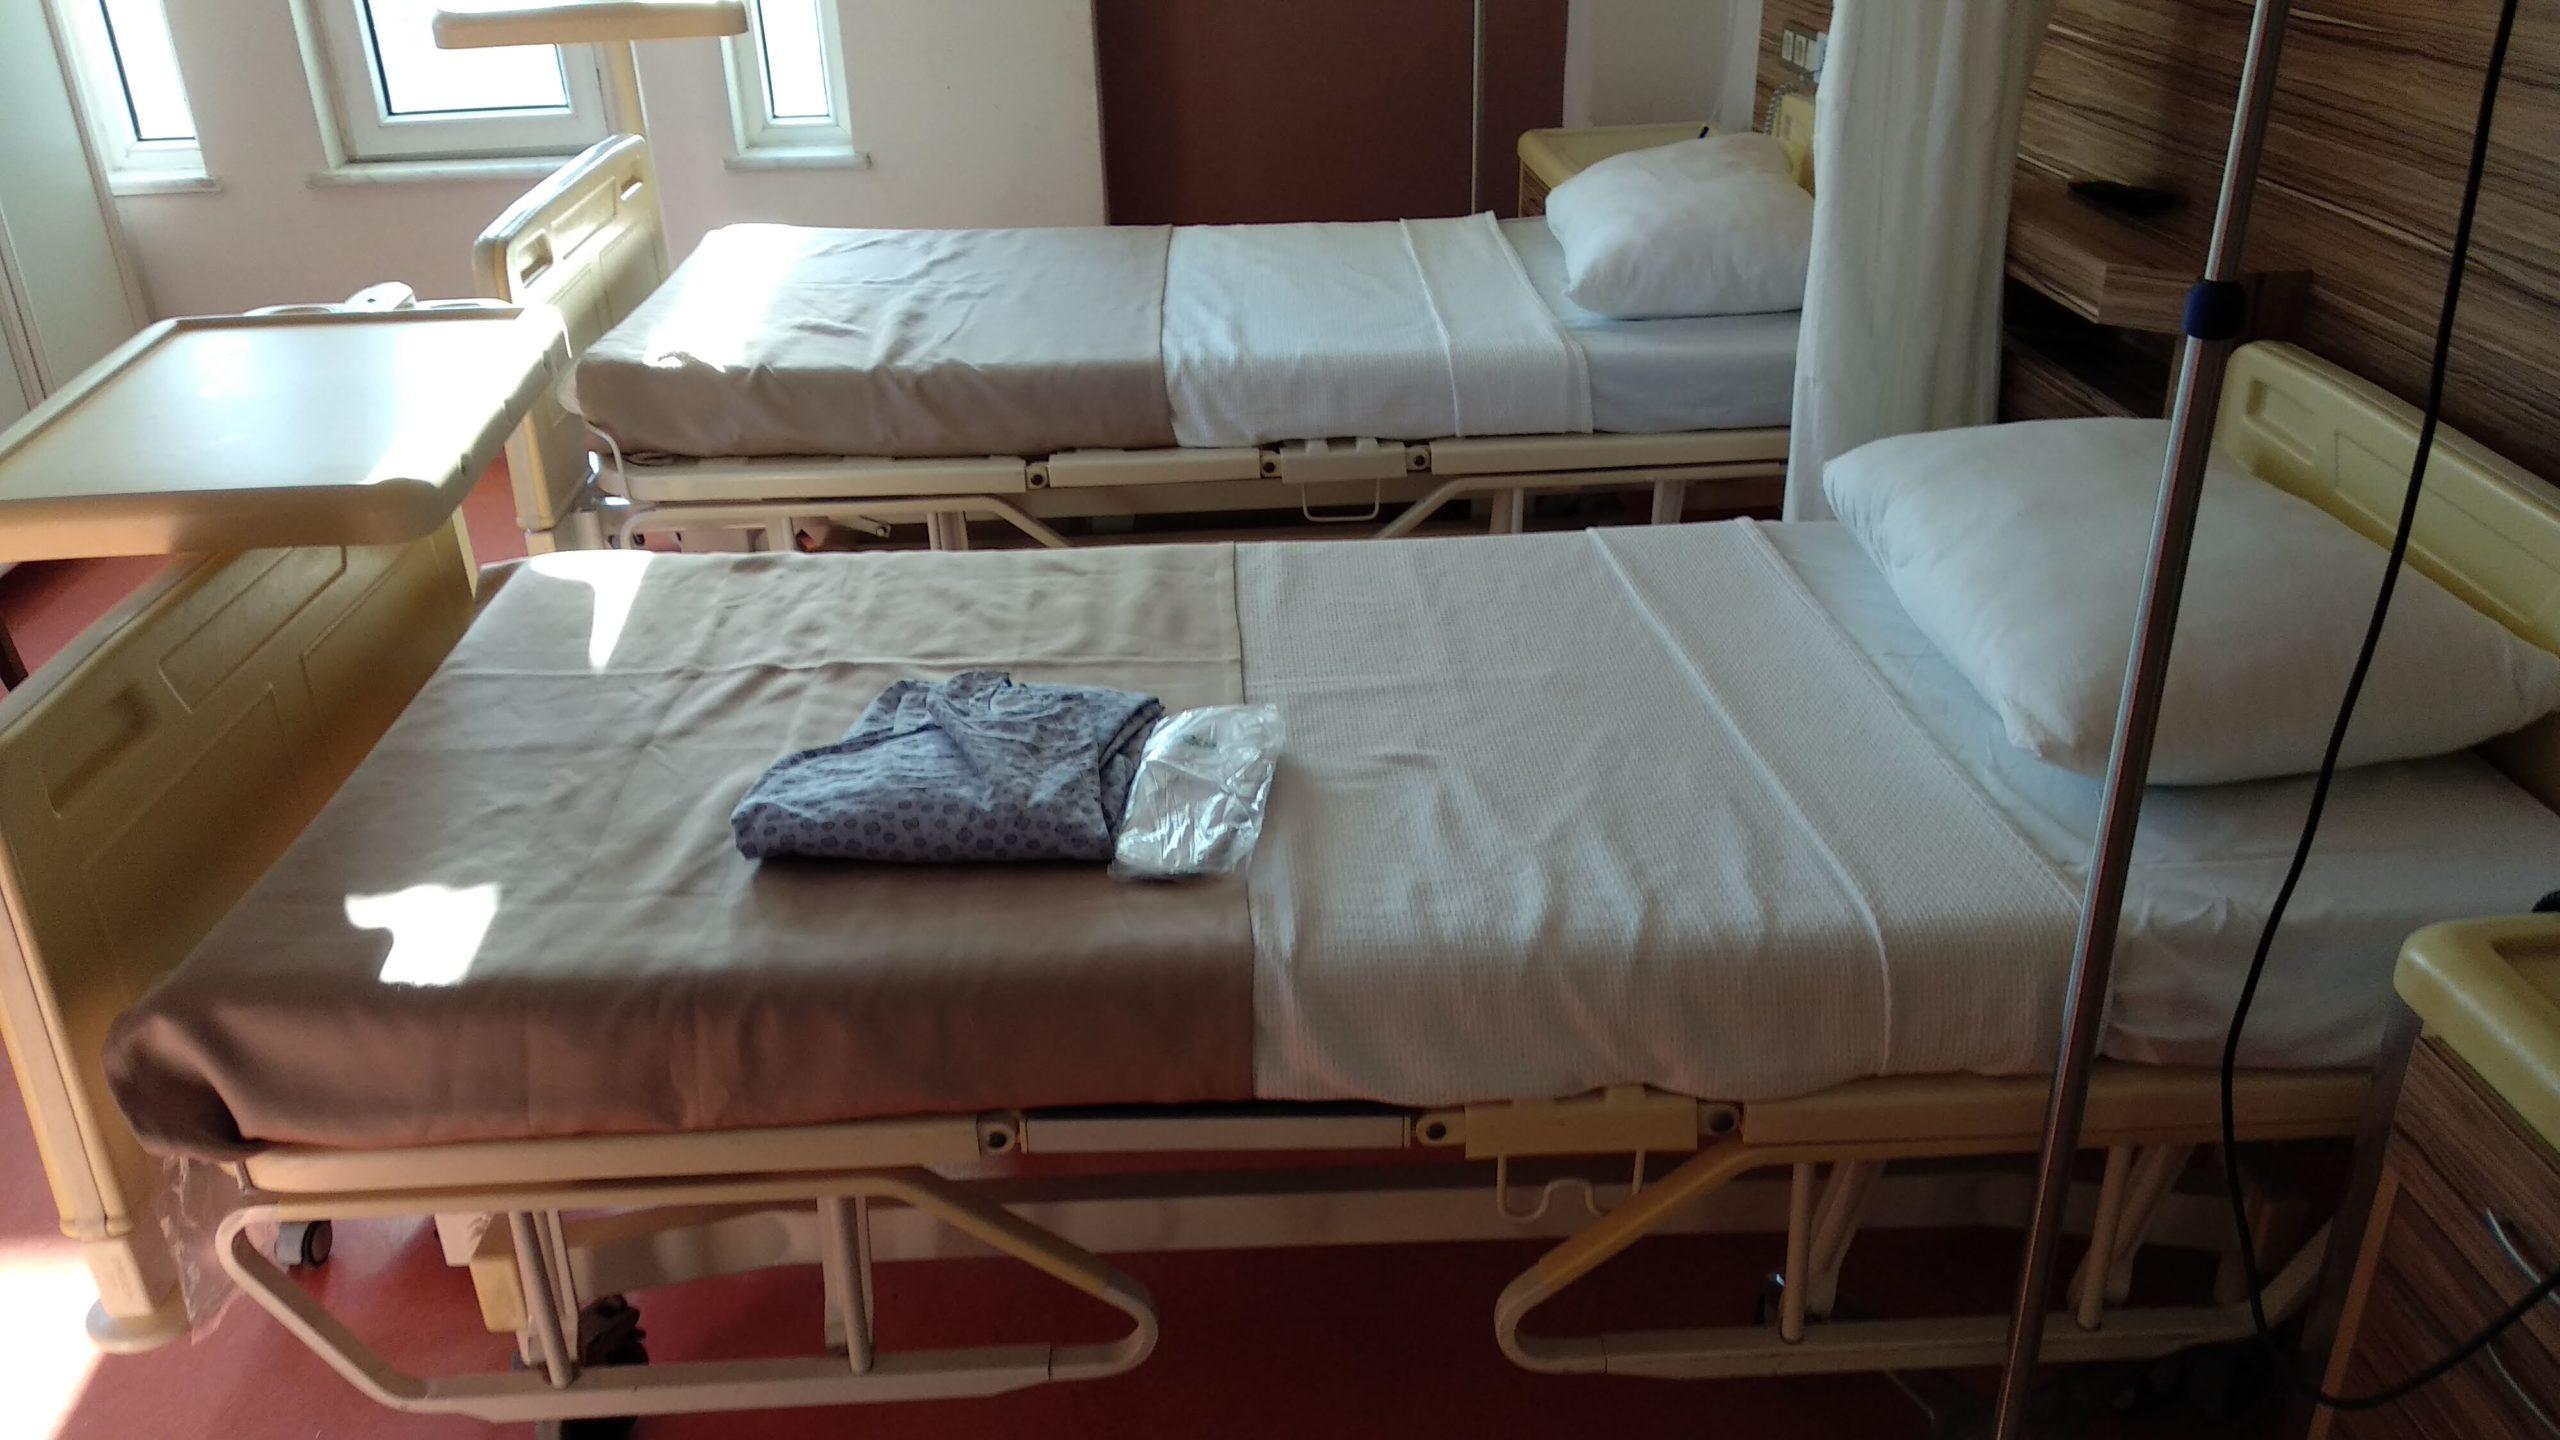 Рубашка и тапочки для операции